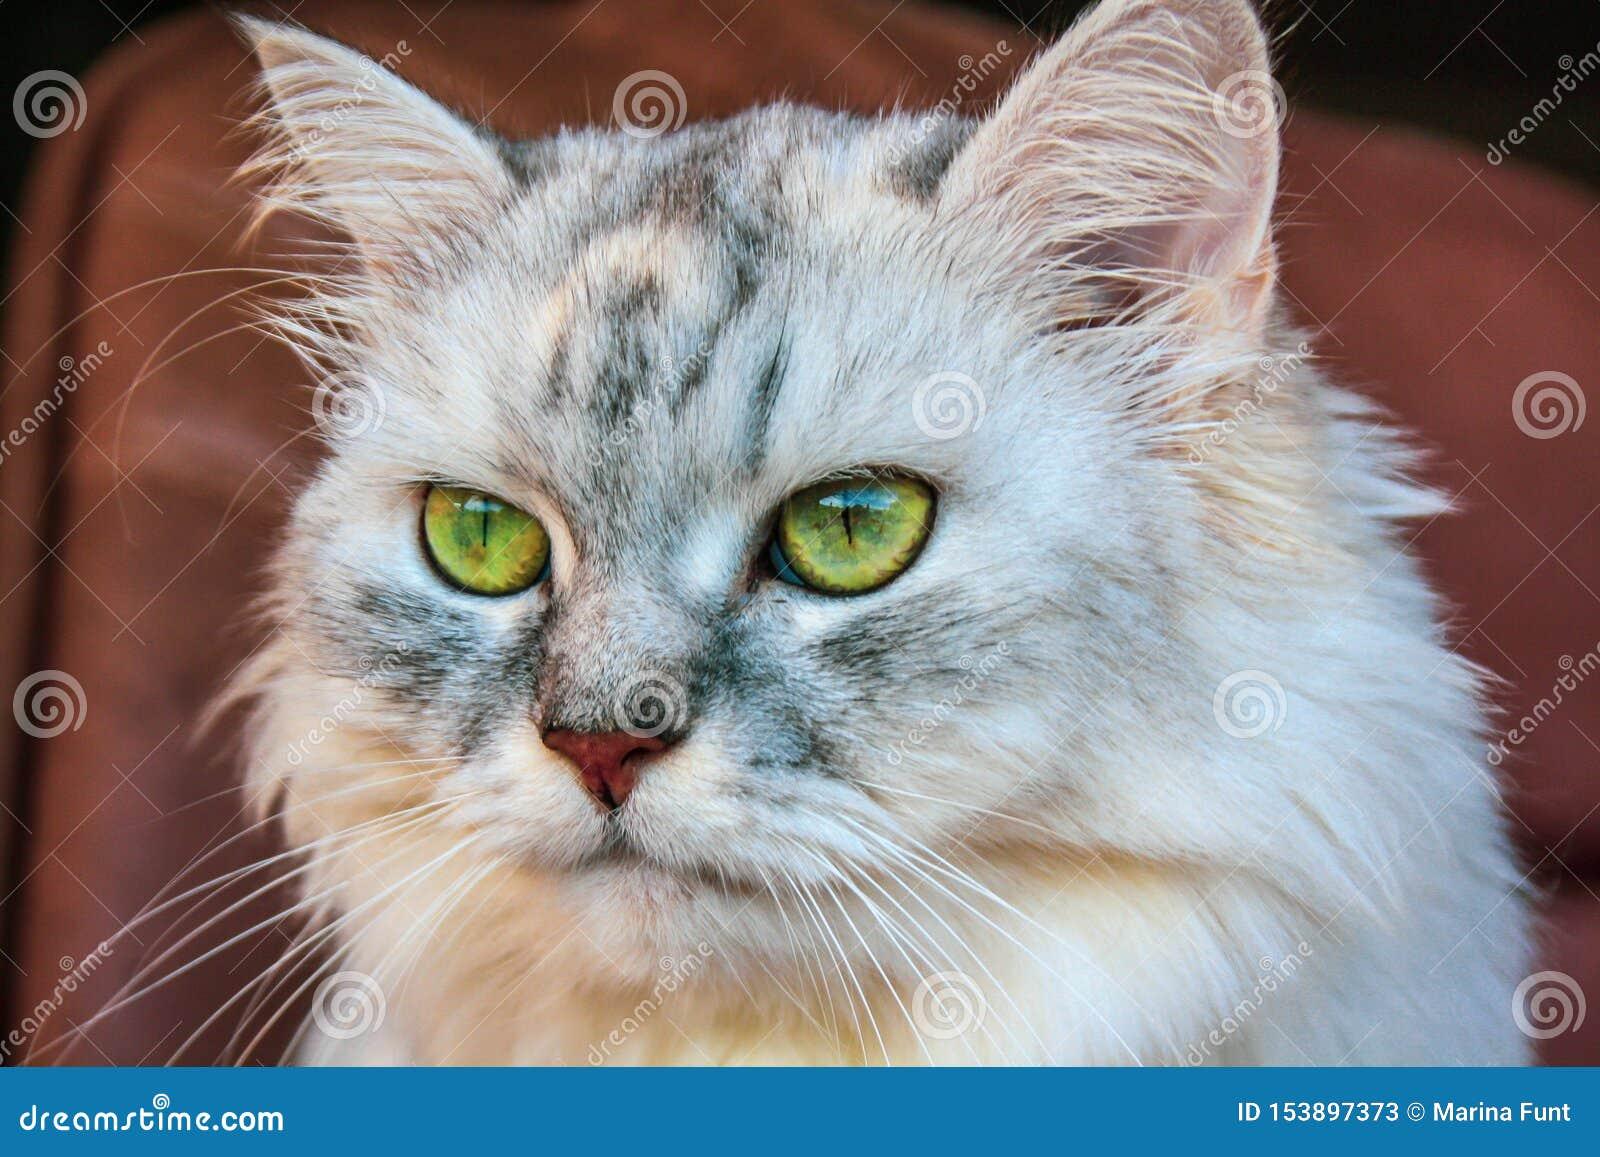 Gato Siberian macio grande com olhos verde-claro